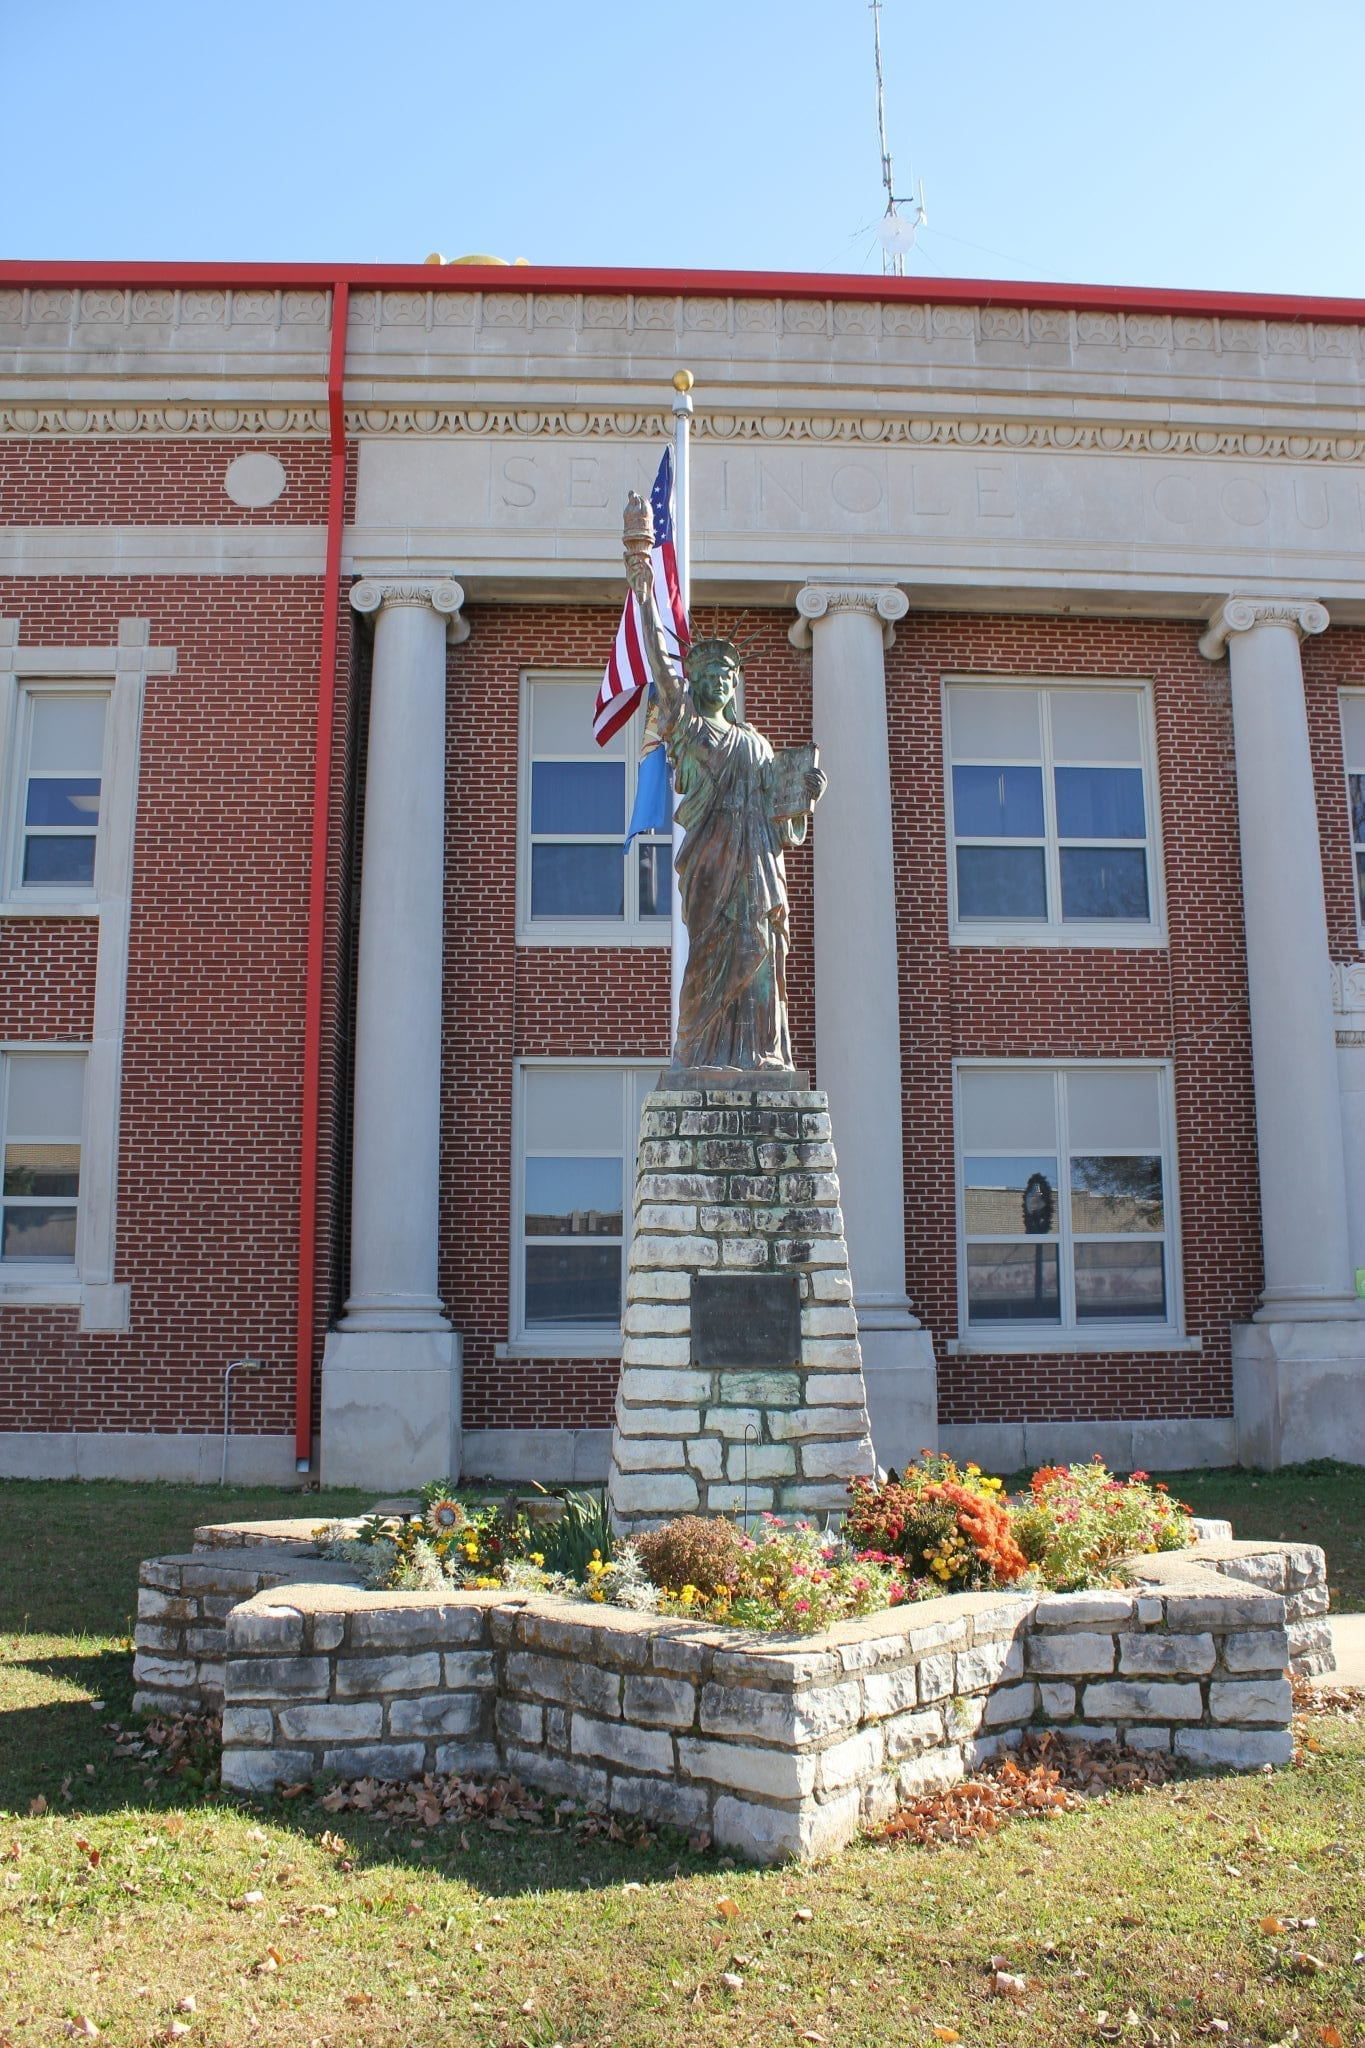 Wewoka Public Schools Building and Statue